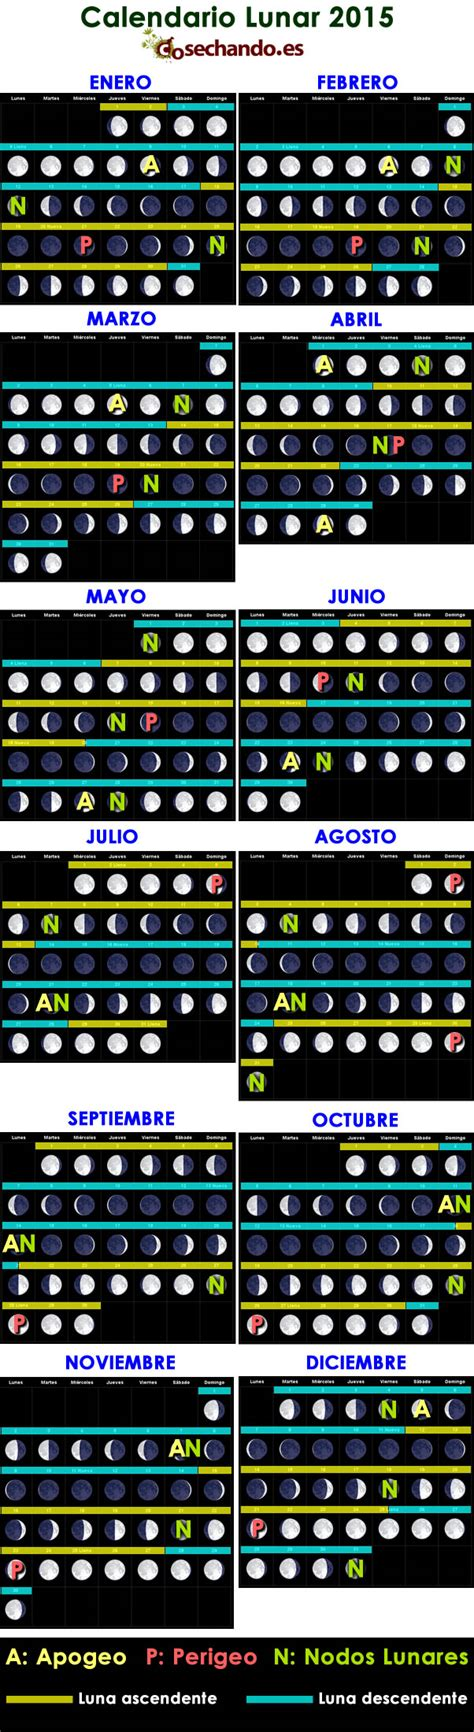 calendario lunar hemisferio sur 2016 calendario lunar 2016 hemisferio sur calendar template